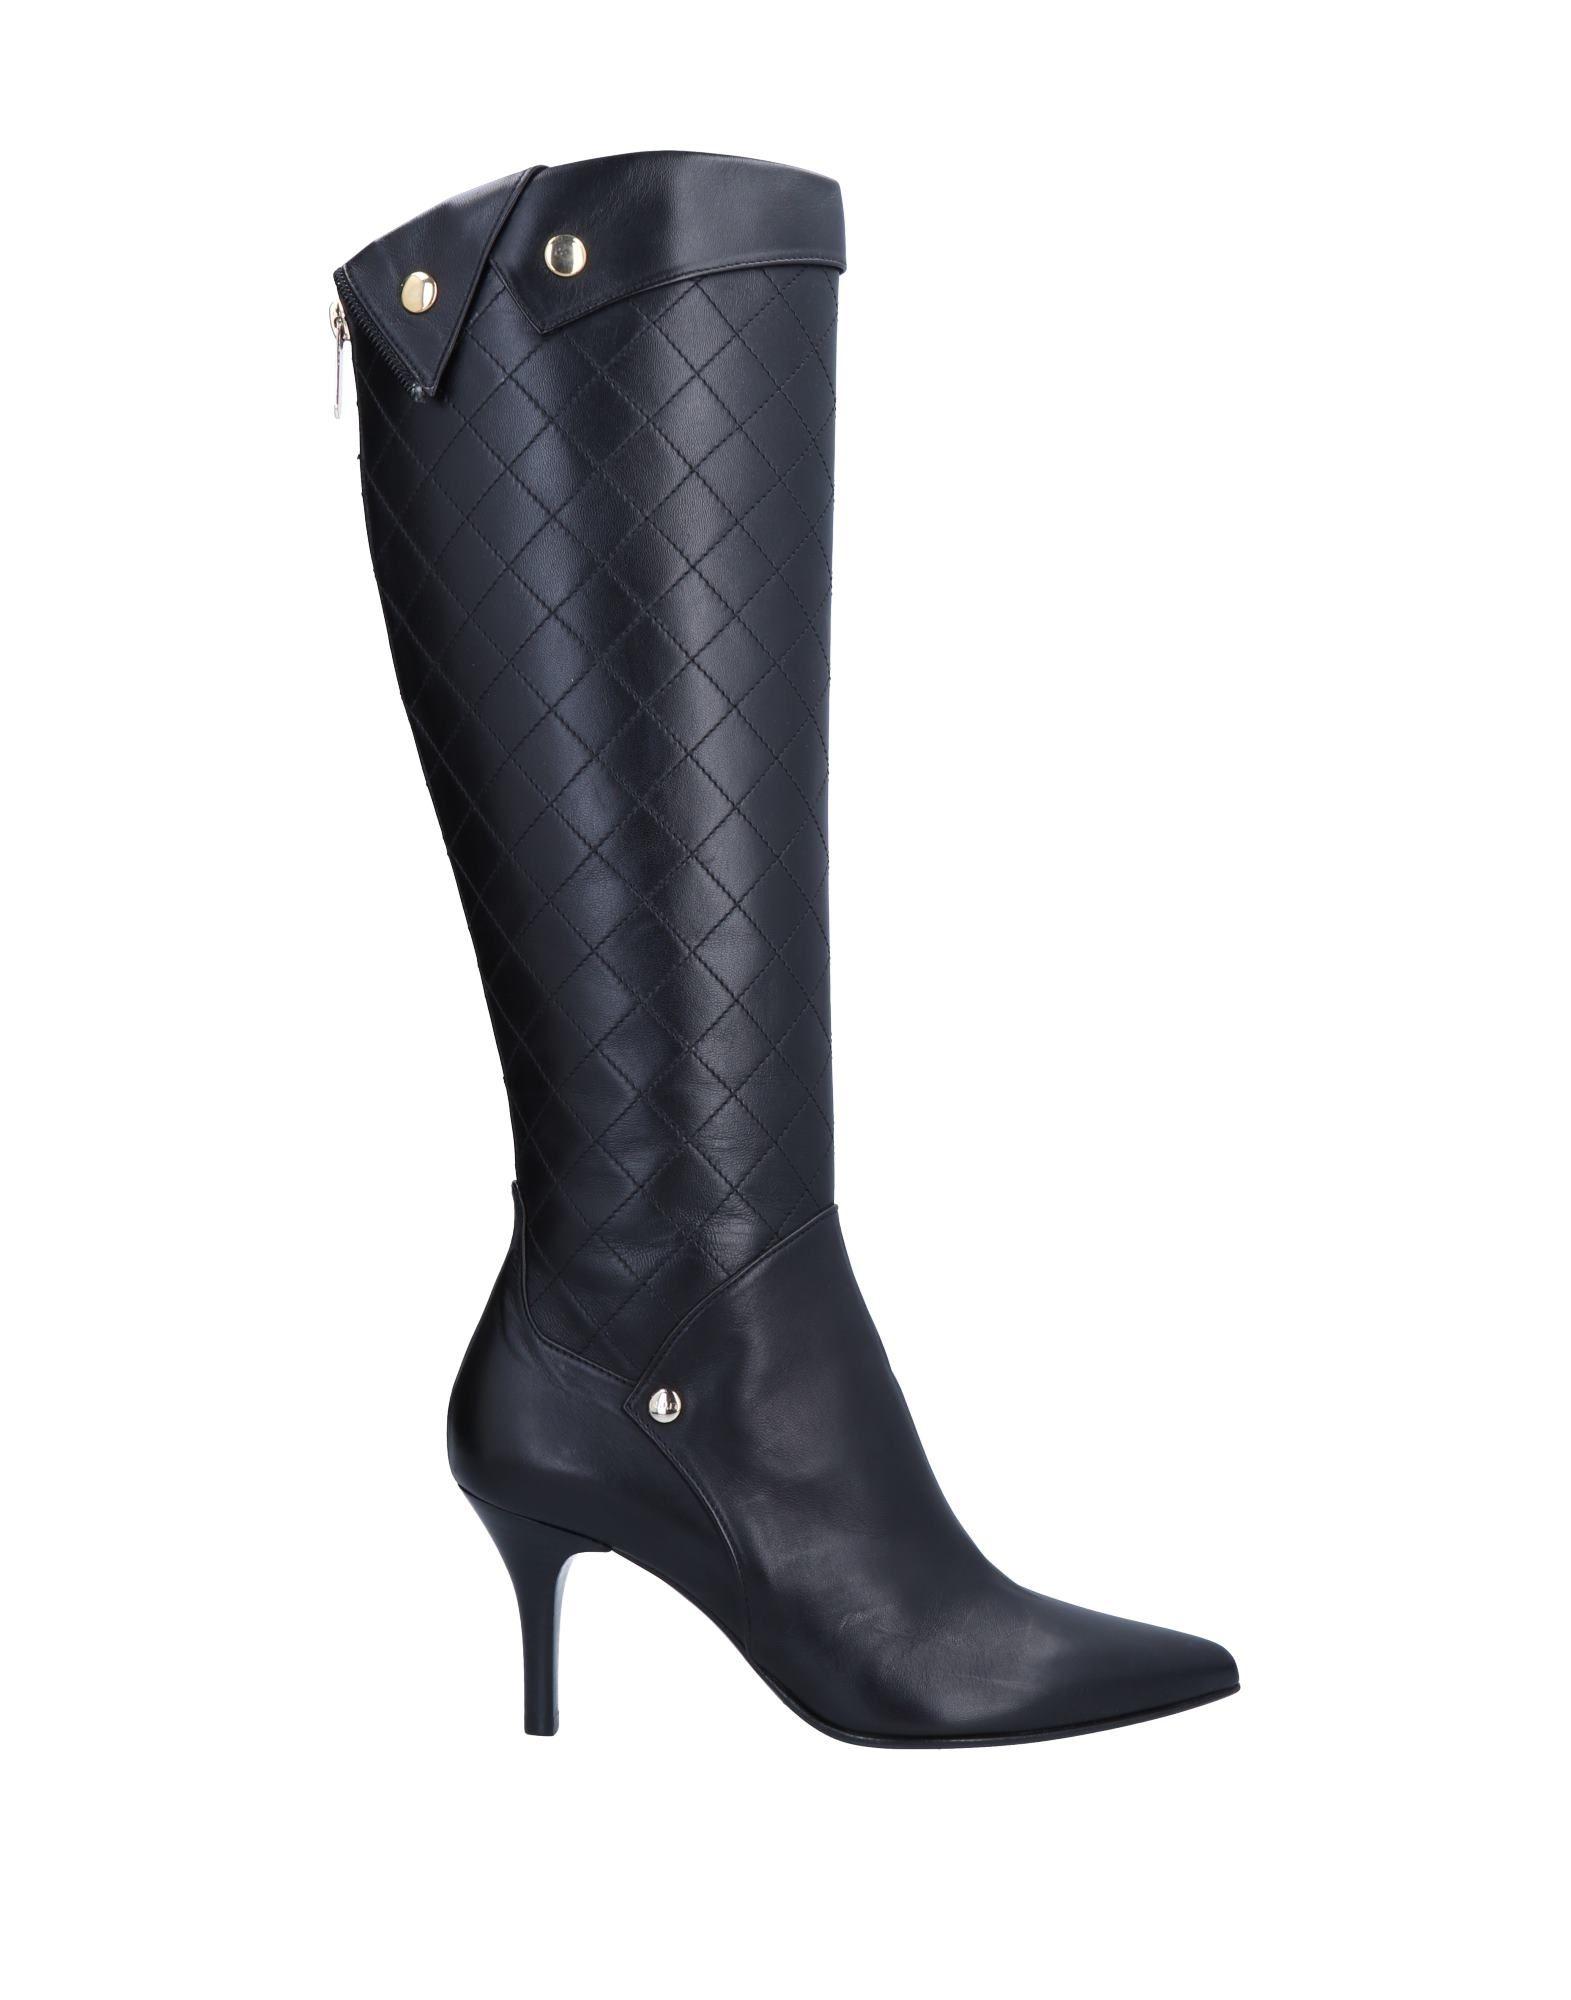 Rabatt Schuhe Norma J.Baker Stiefel Stiefel Stiefel Damen 11557892NW a8523d